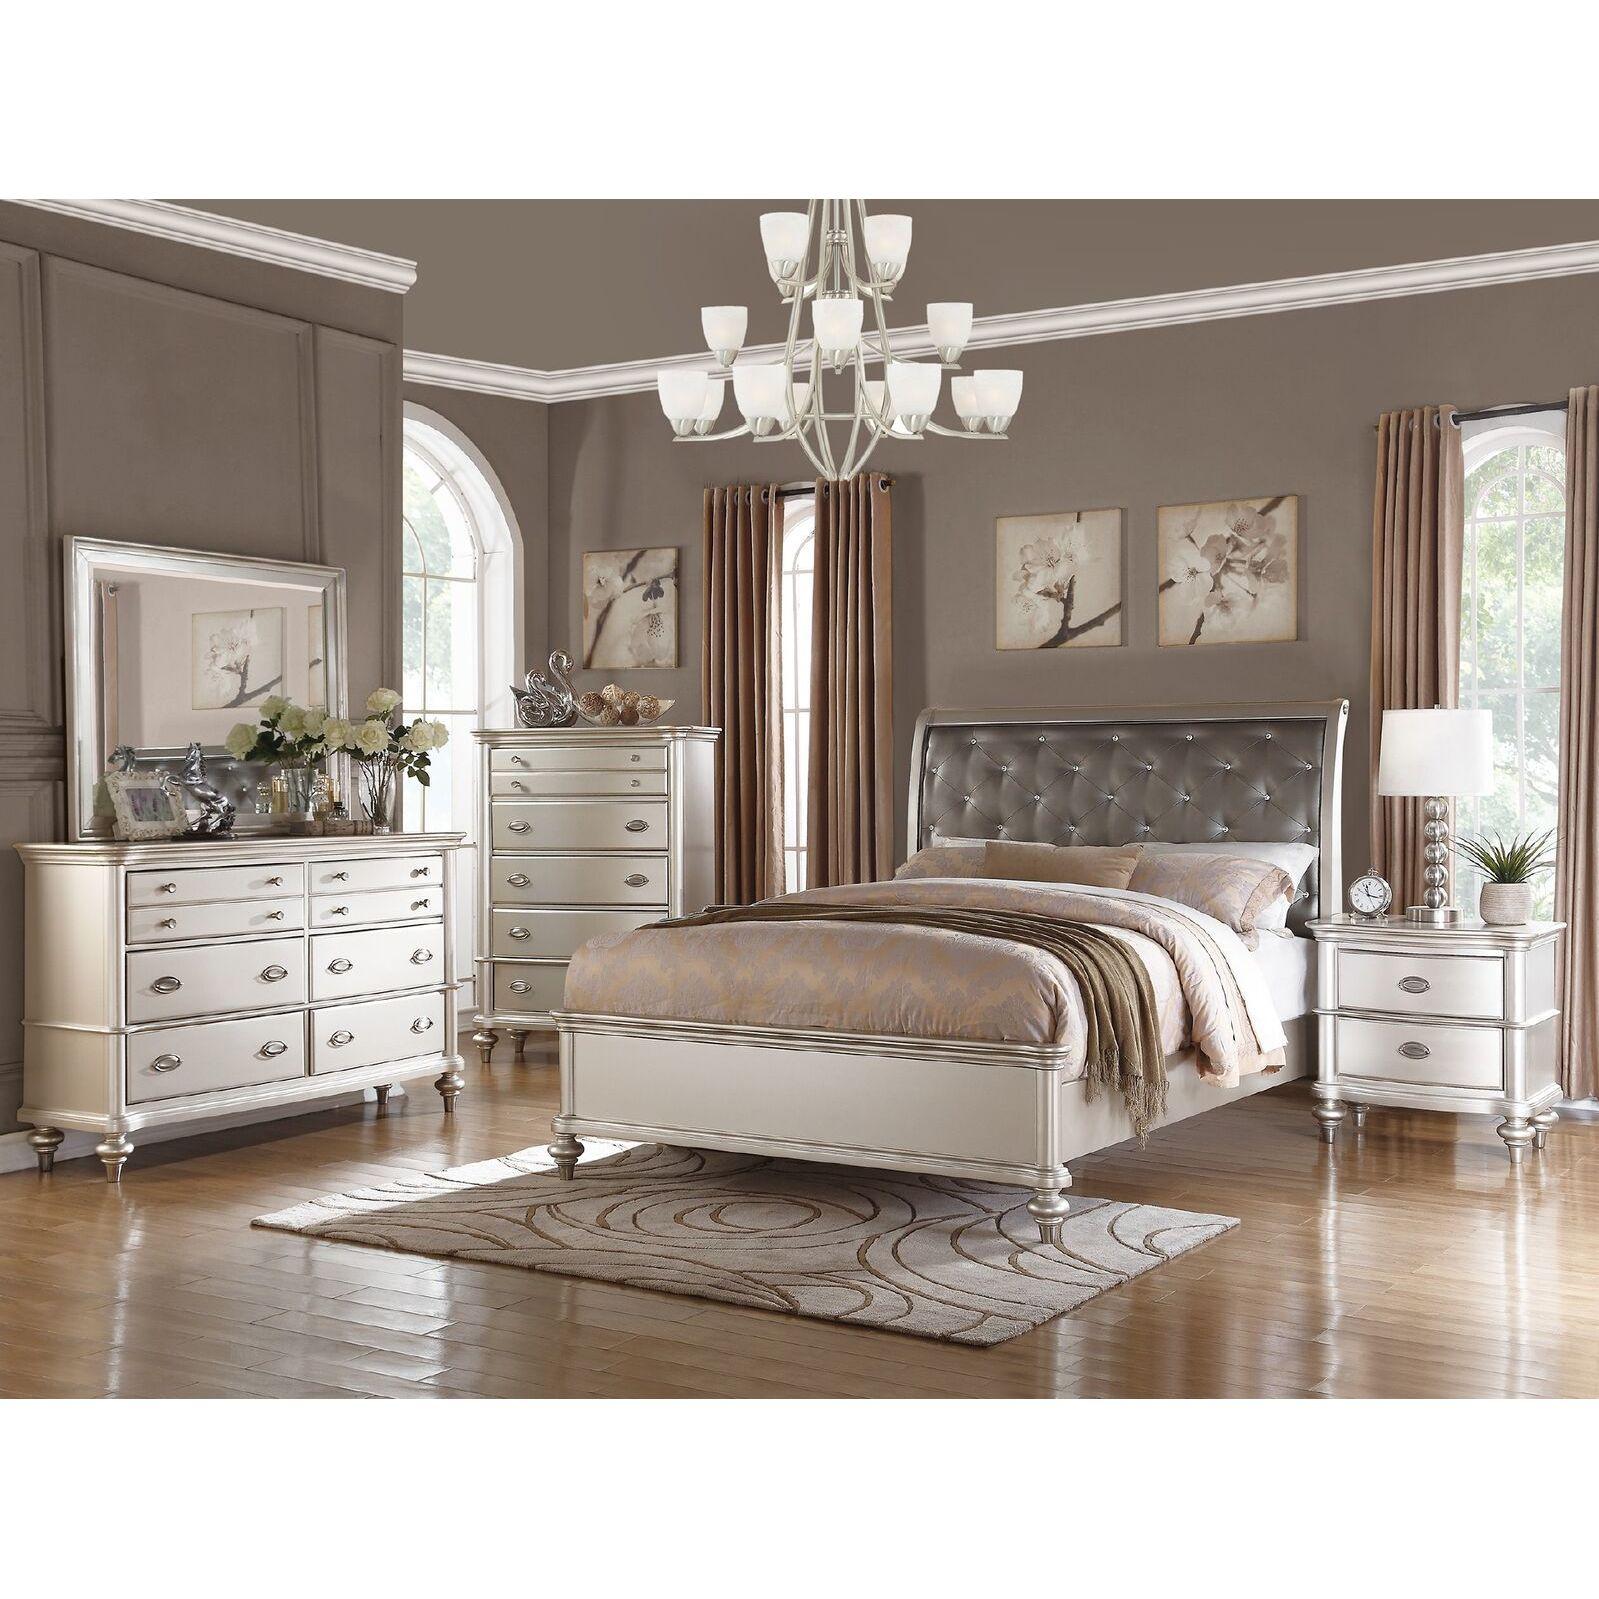 Saveria 4 Piece Bedroom Set Add To Cart